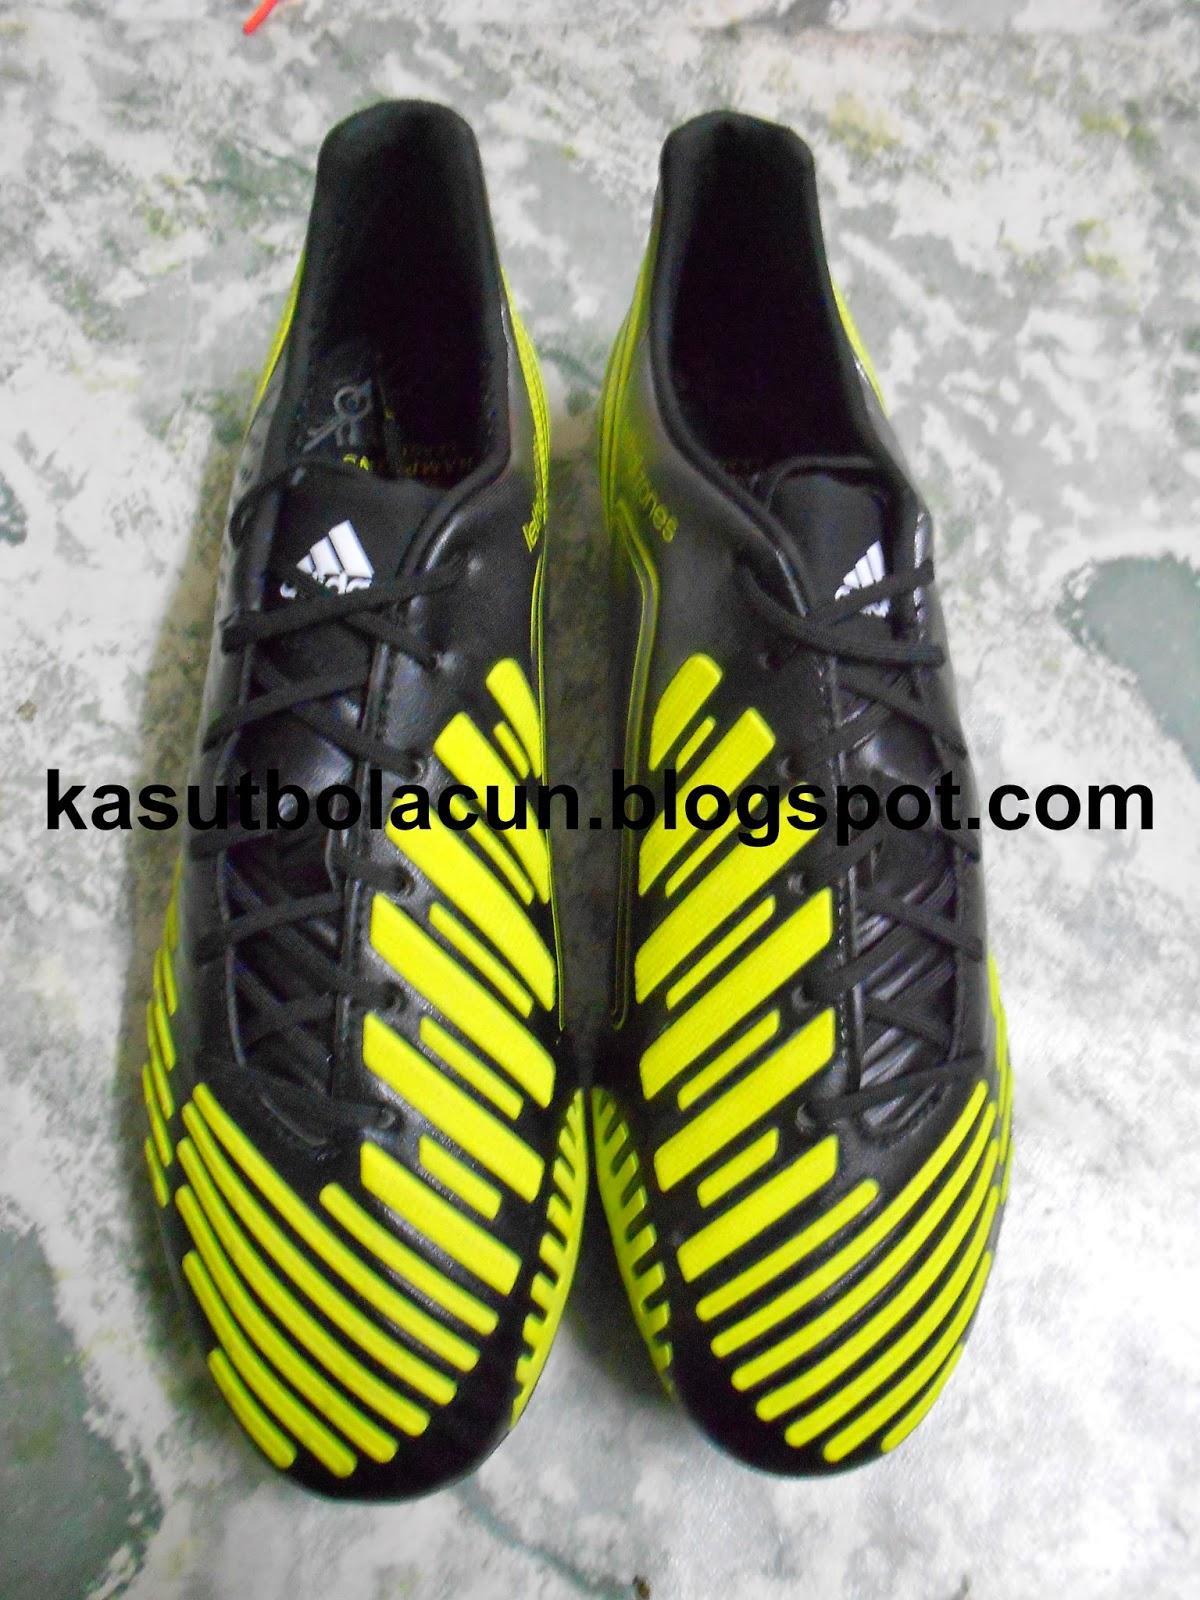 Adidas Predator LZ SG